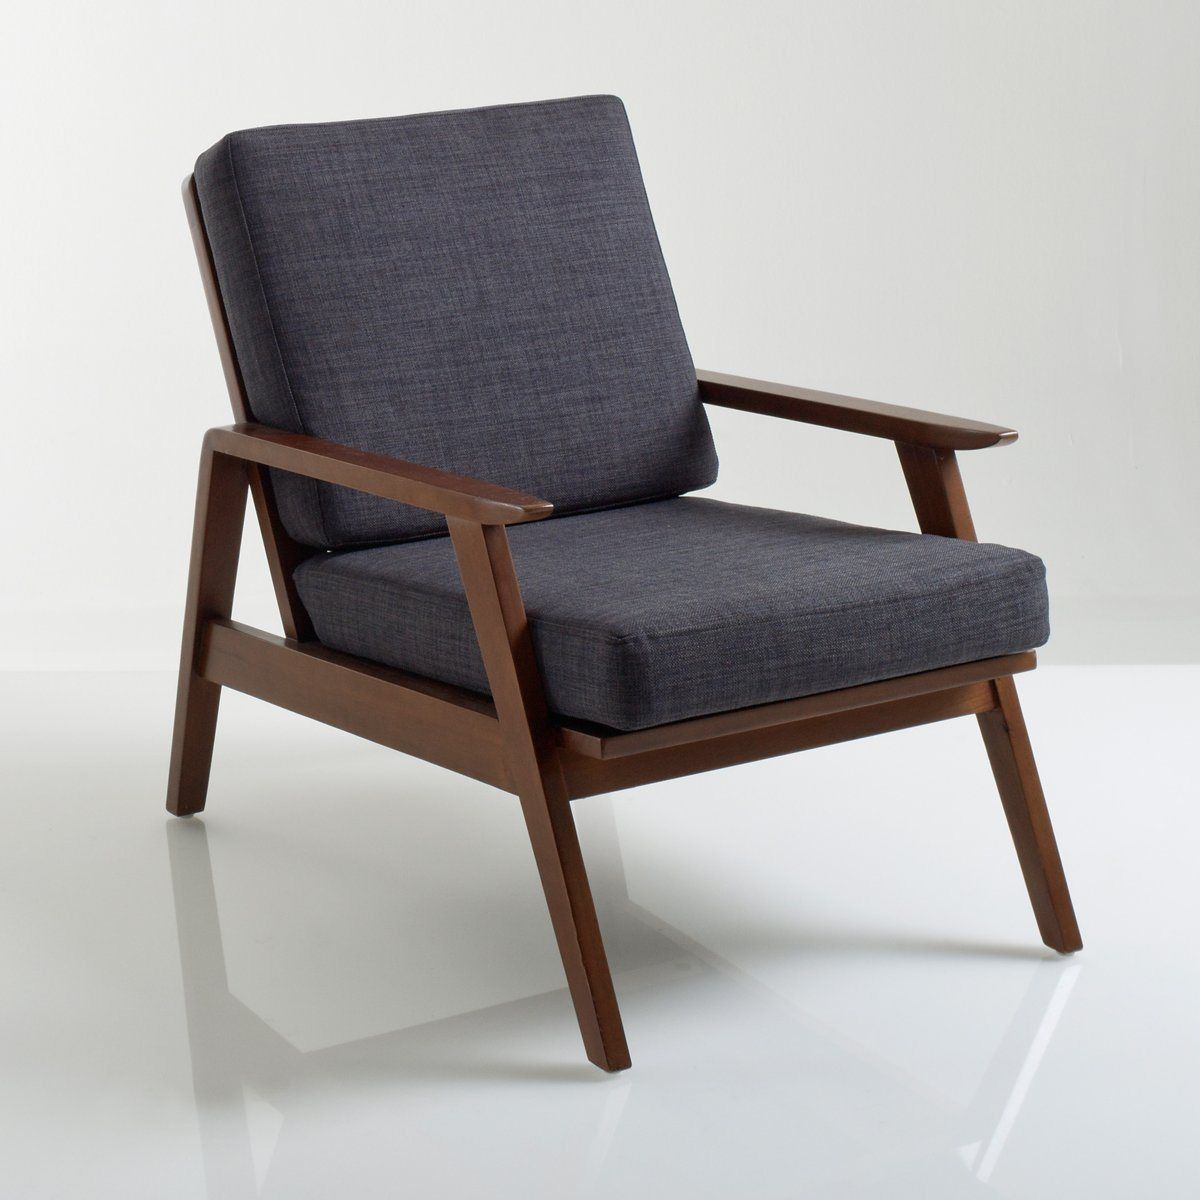 Fauteuil retro fauteuil cars | Generationgamer - Fauteuil Retro